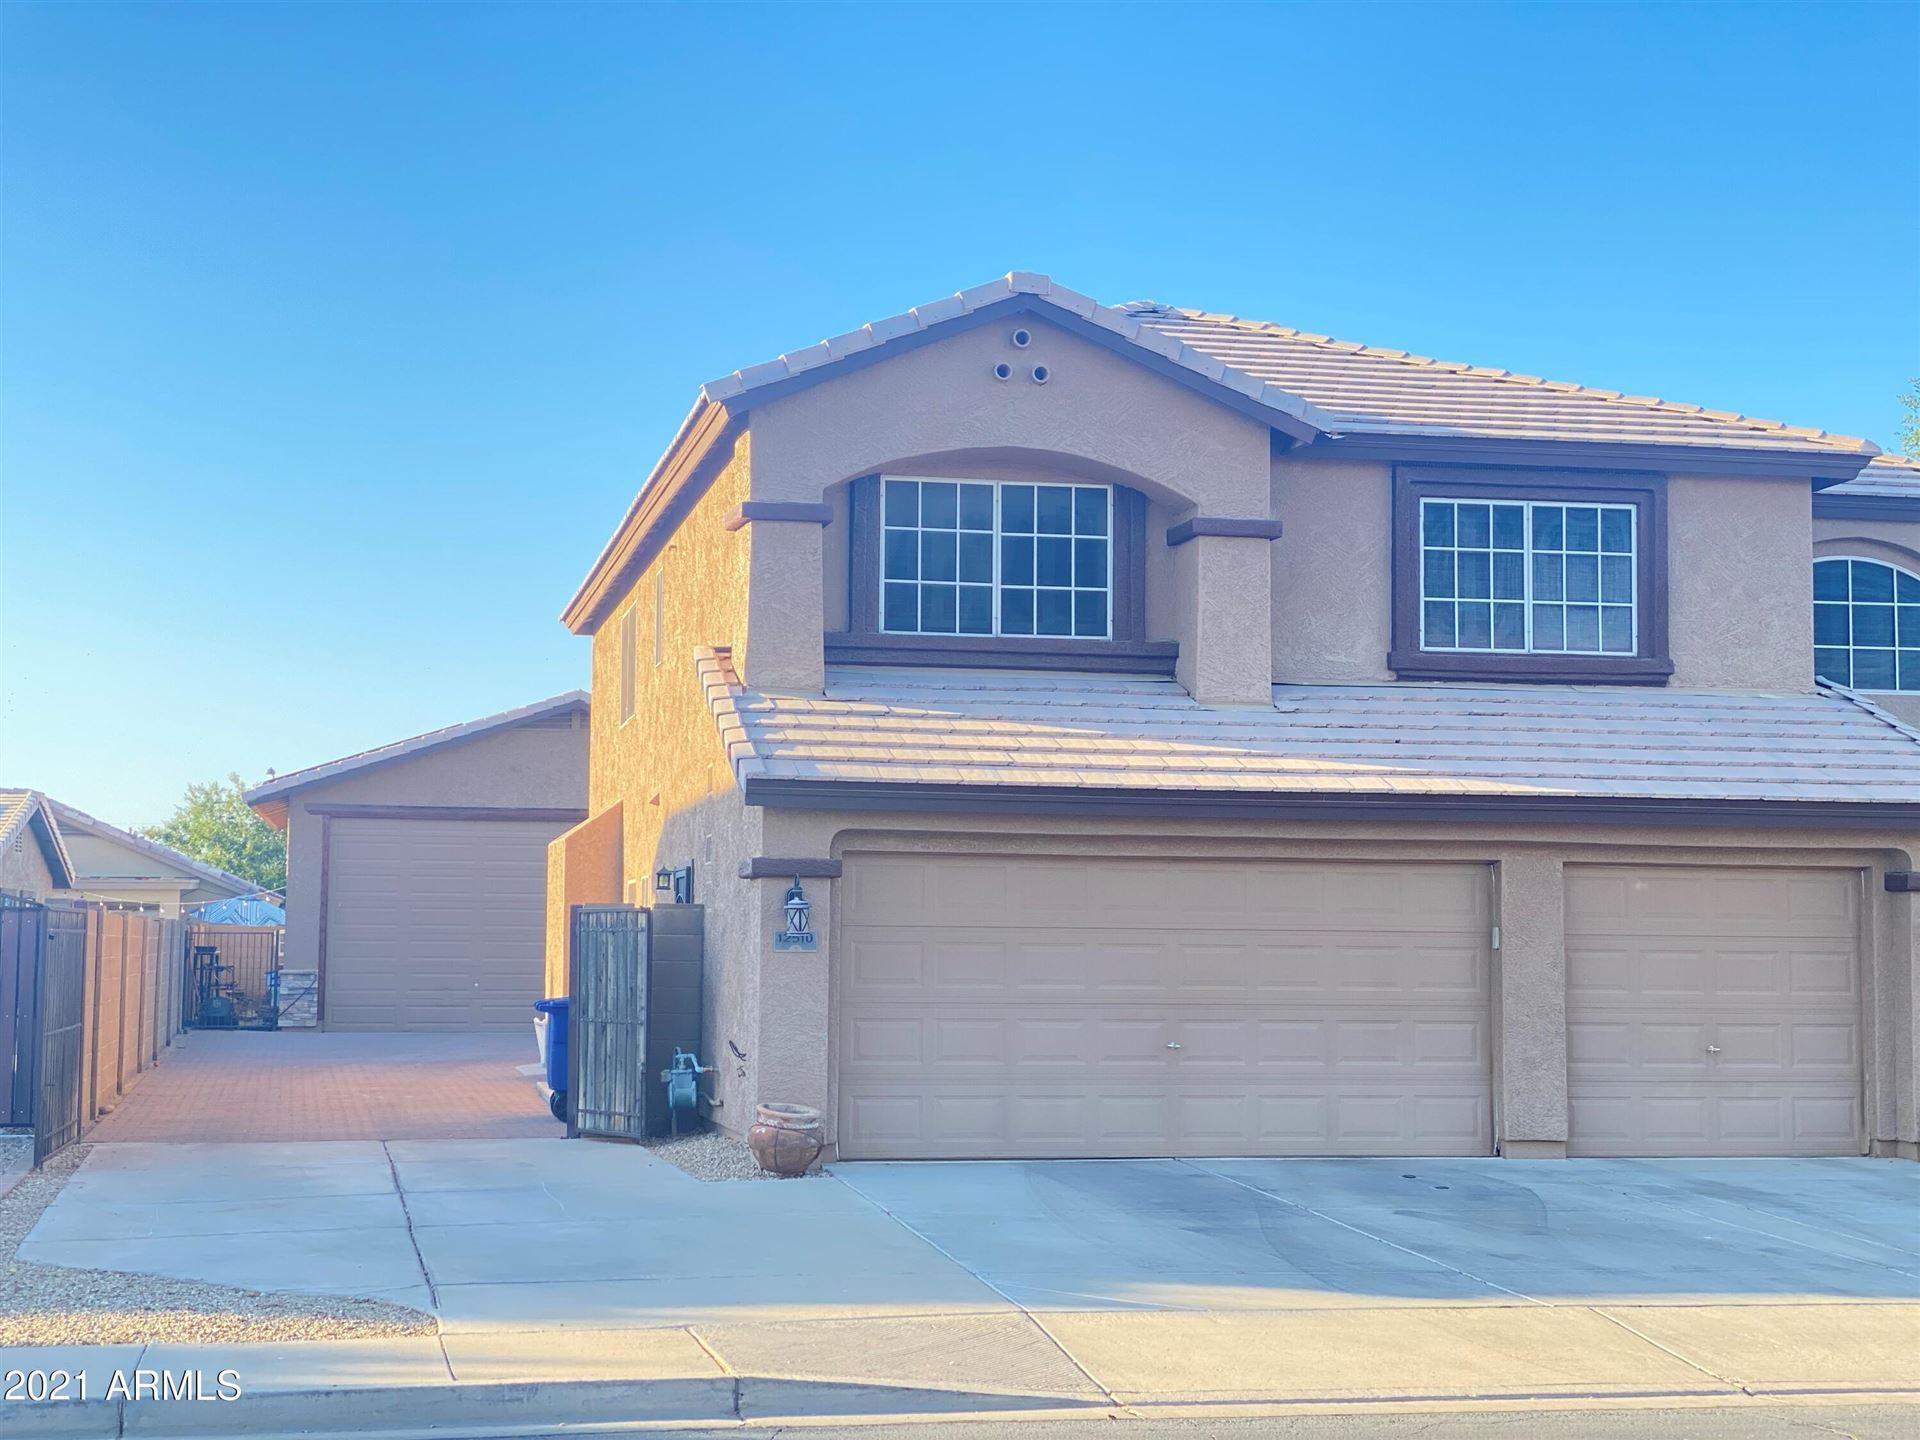 Photo of 12510 W SUNNYSIDE Drive, El Mirage, AZ 85335 (MLS # 6237425)